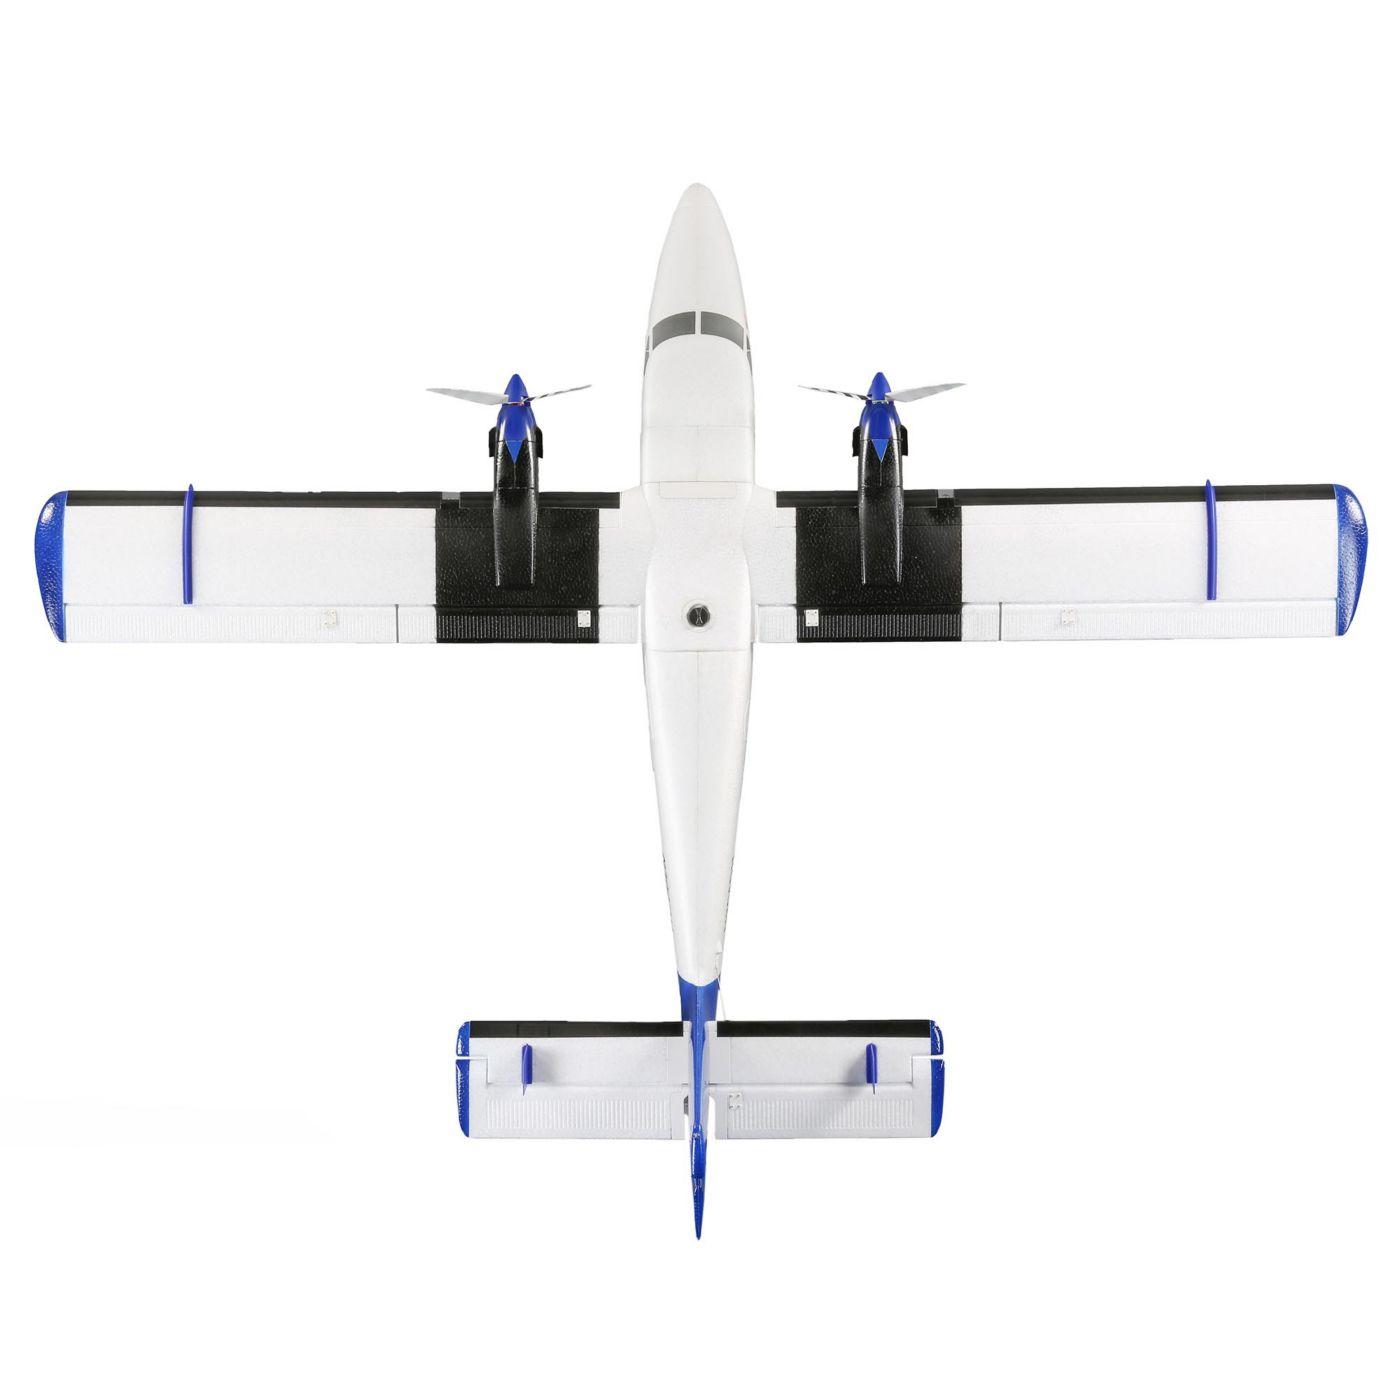 Twin Otter DHC-6 E-flite